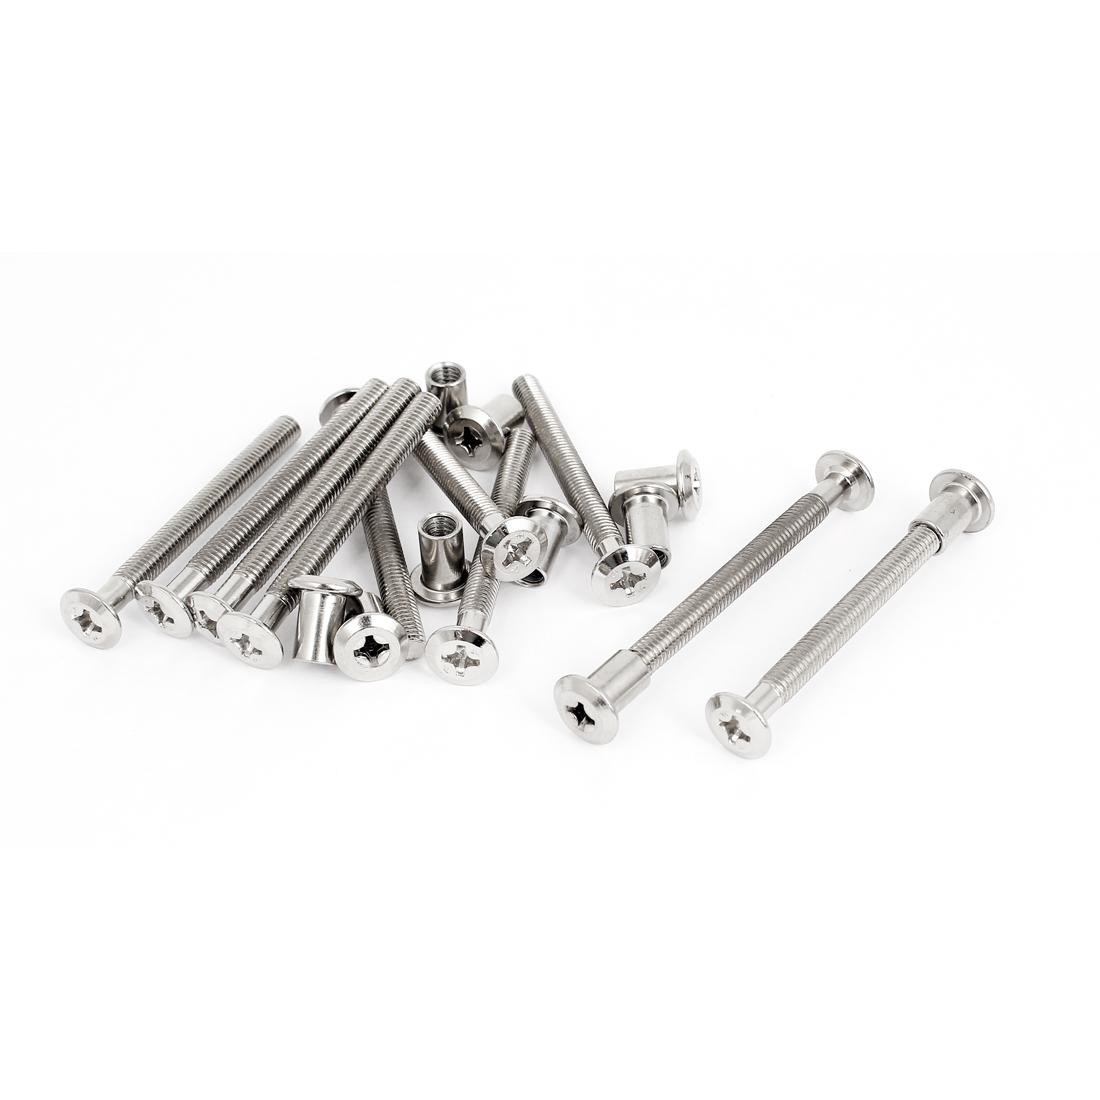 10 Sets 6mm x 65mm Phillips Socket Countersunk Screw Bolts Furniture Barrel Nuts